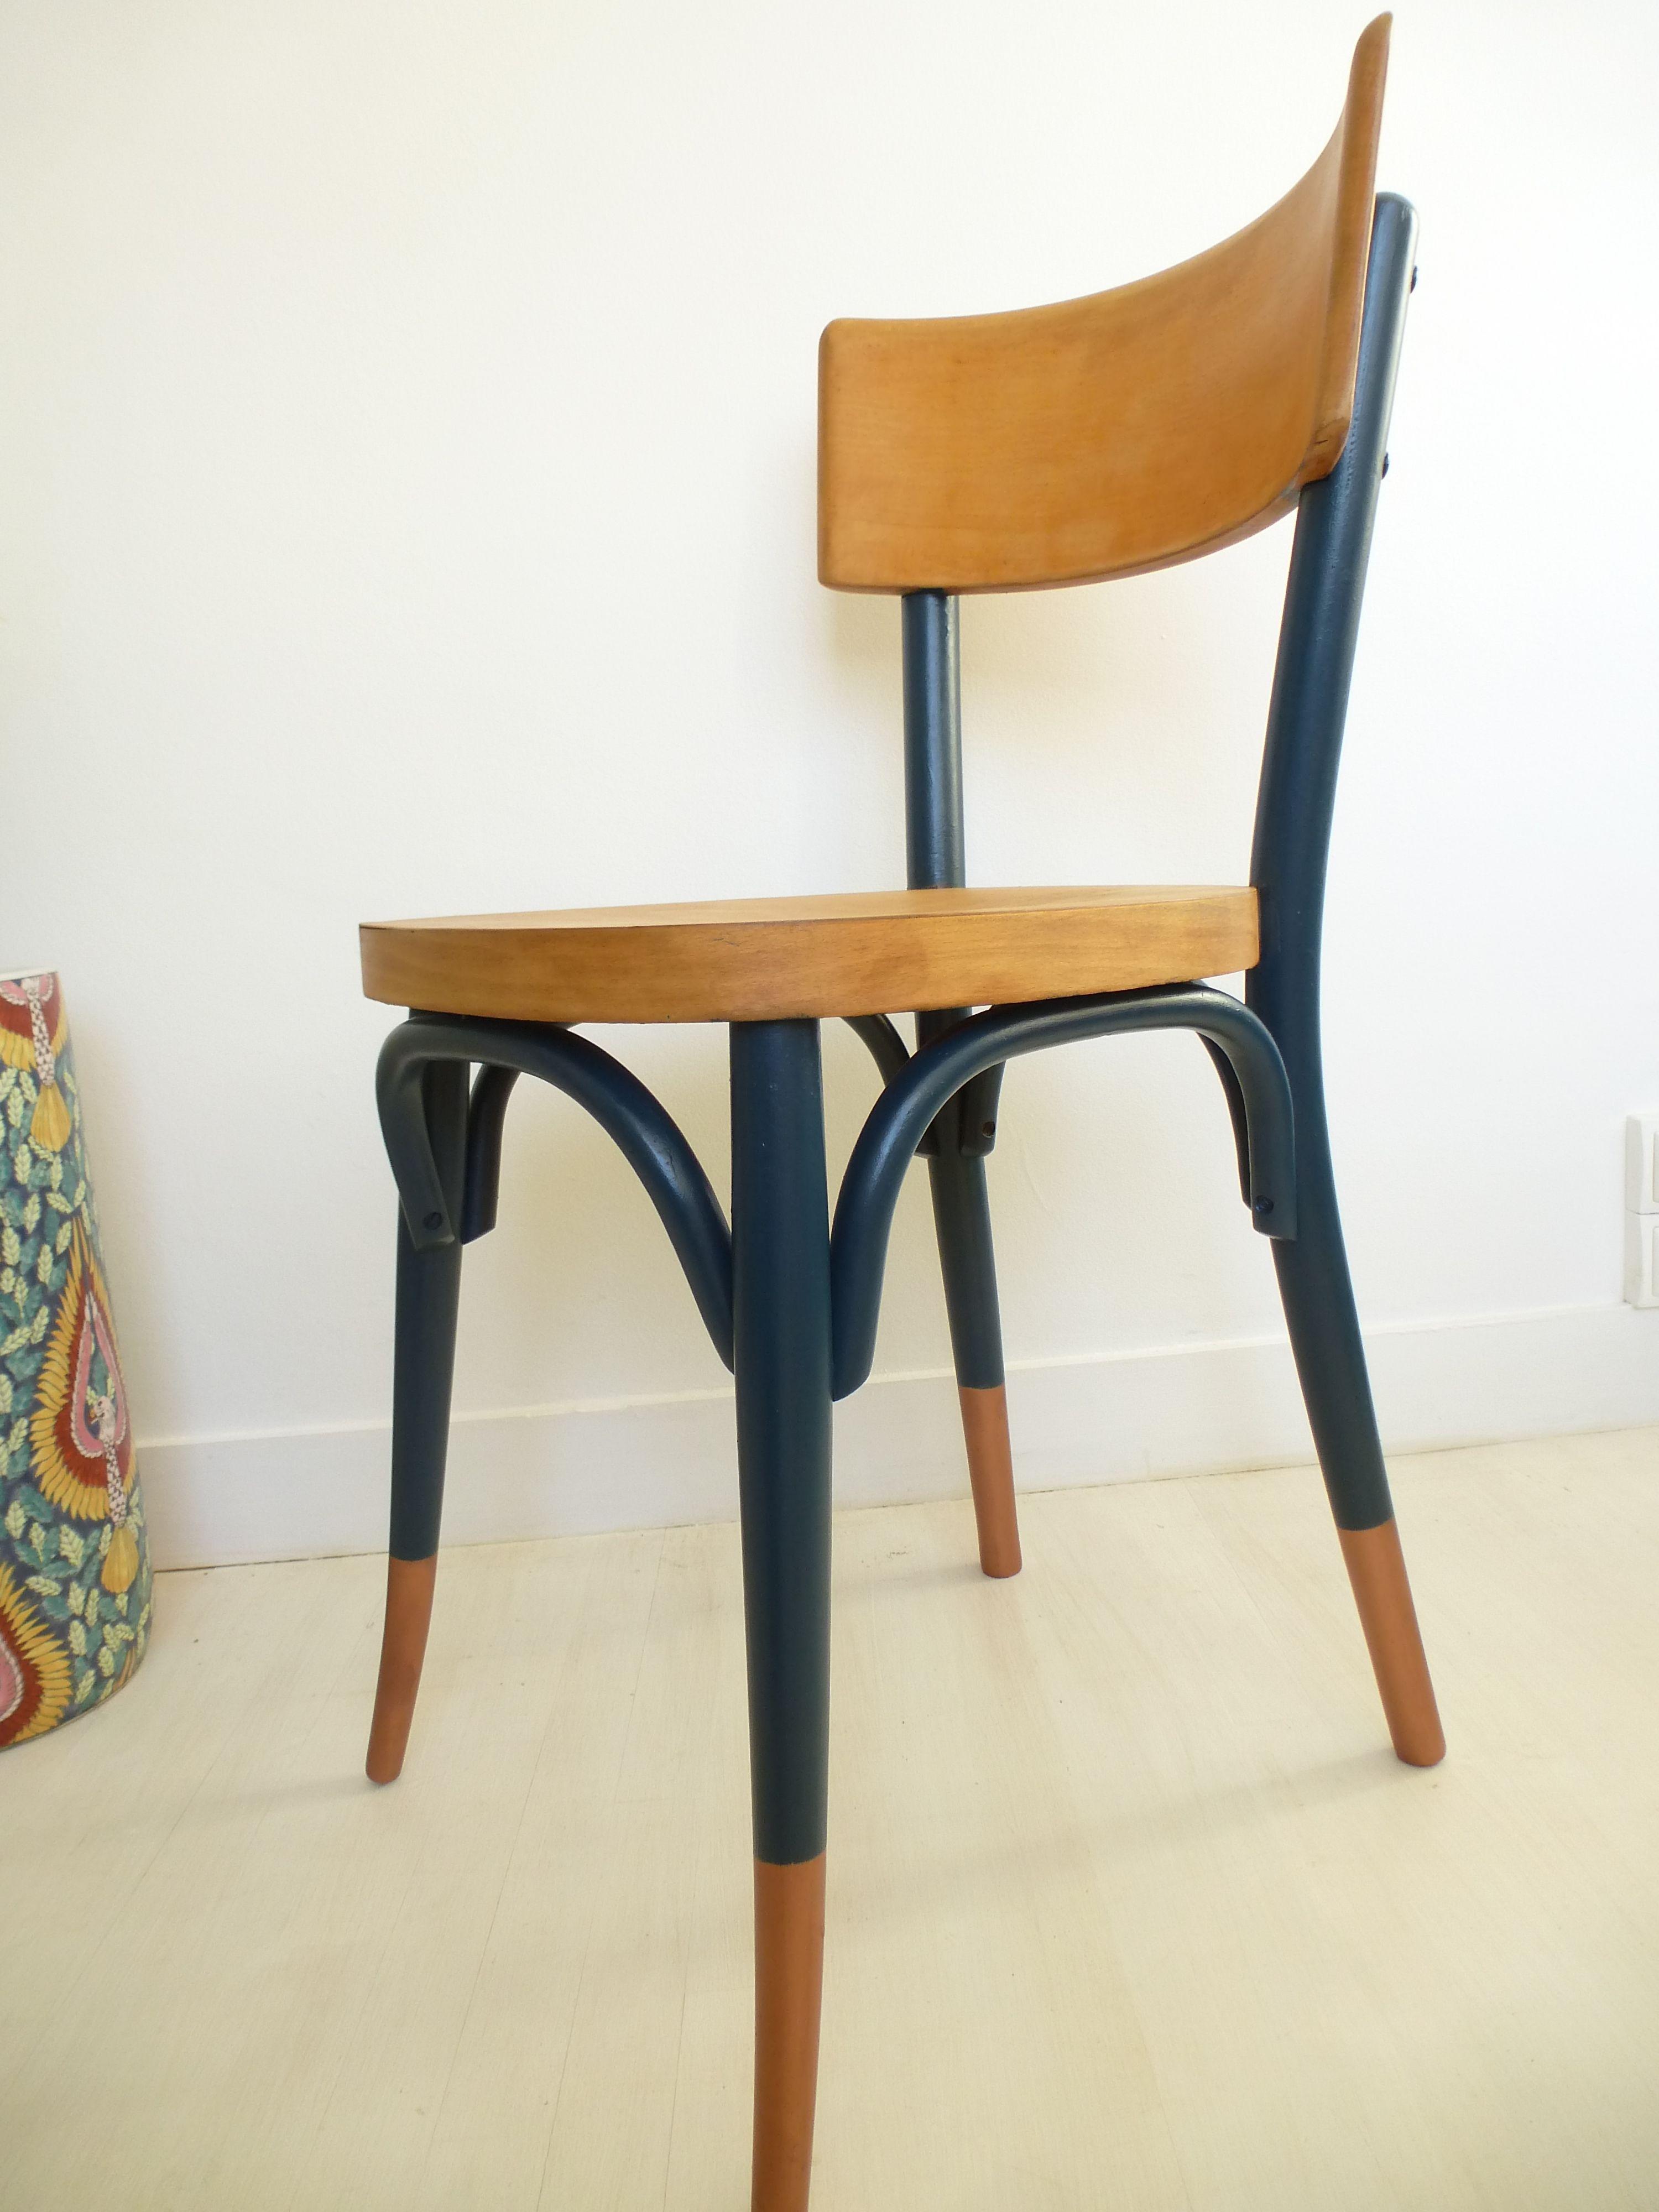 chaise baumann vintage relookée tons bleu bois cuivre   beach house